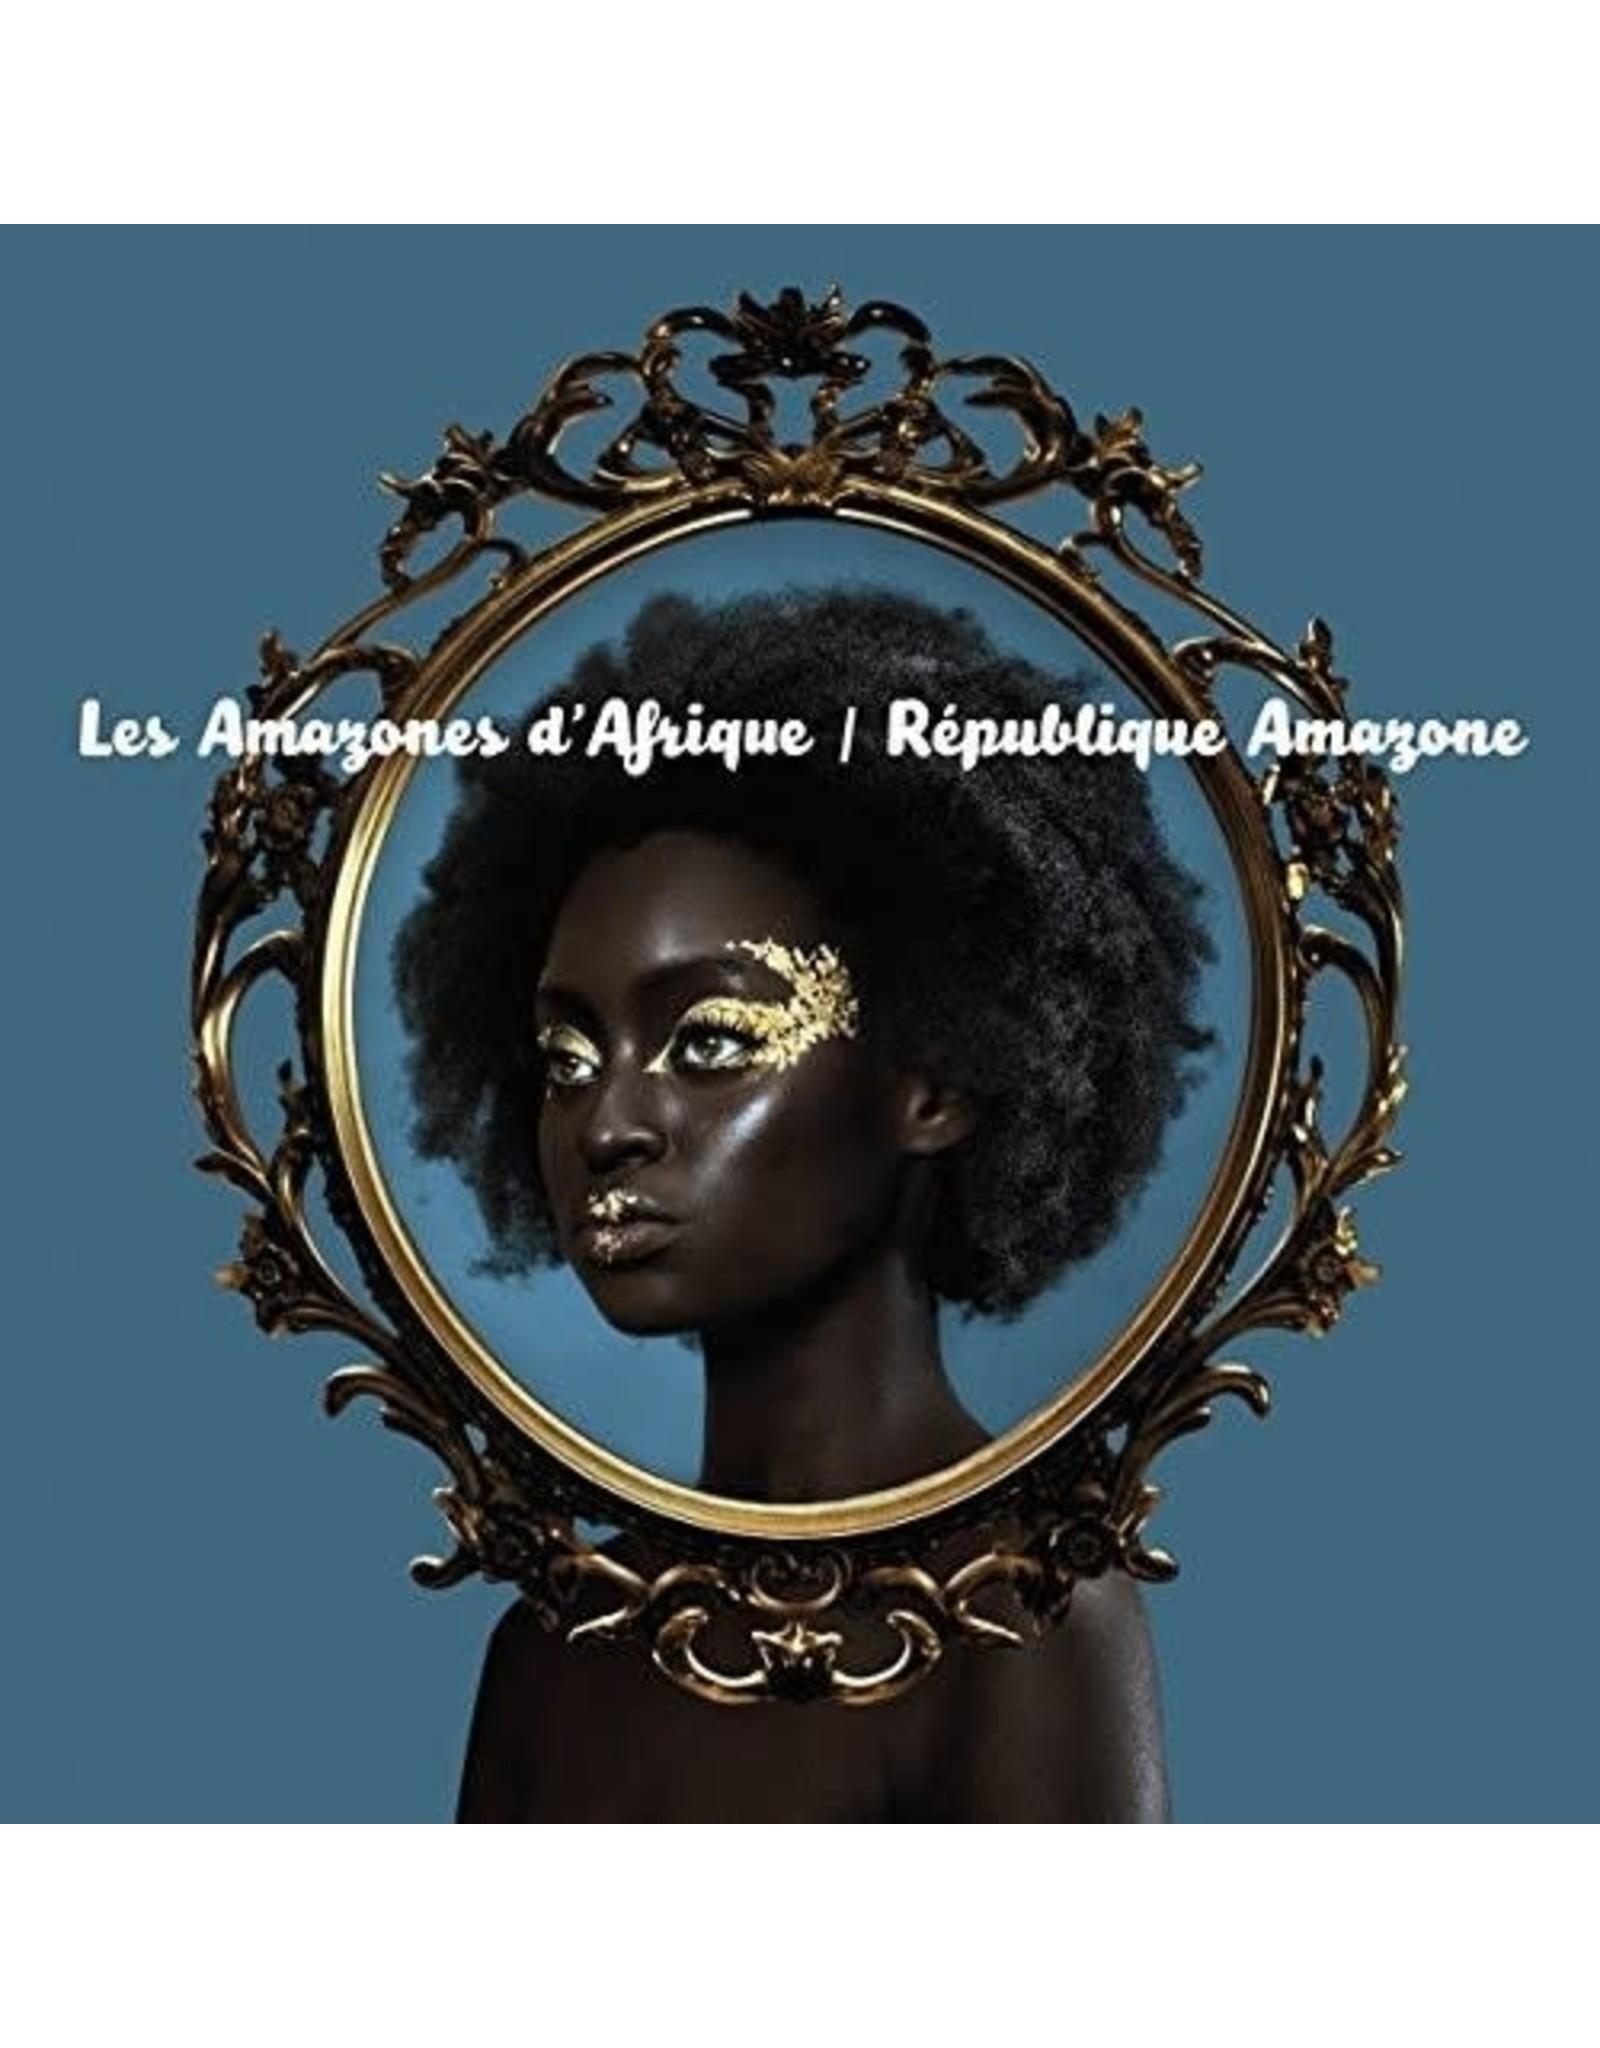 Amazones D'Afrique / Republique Amazone (Colored Vinyl)